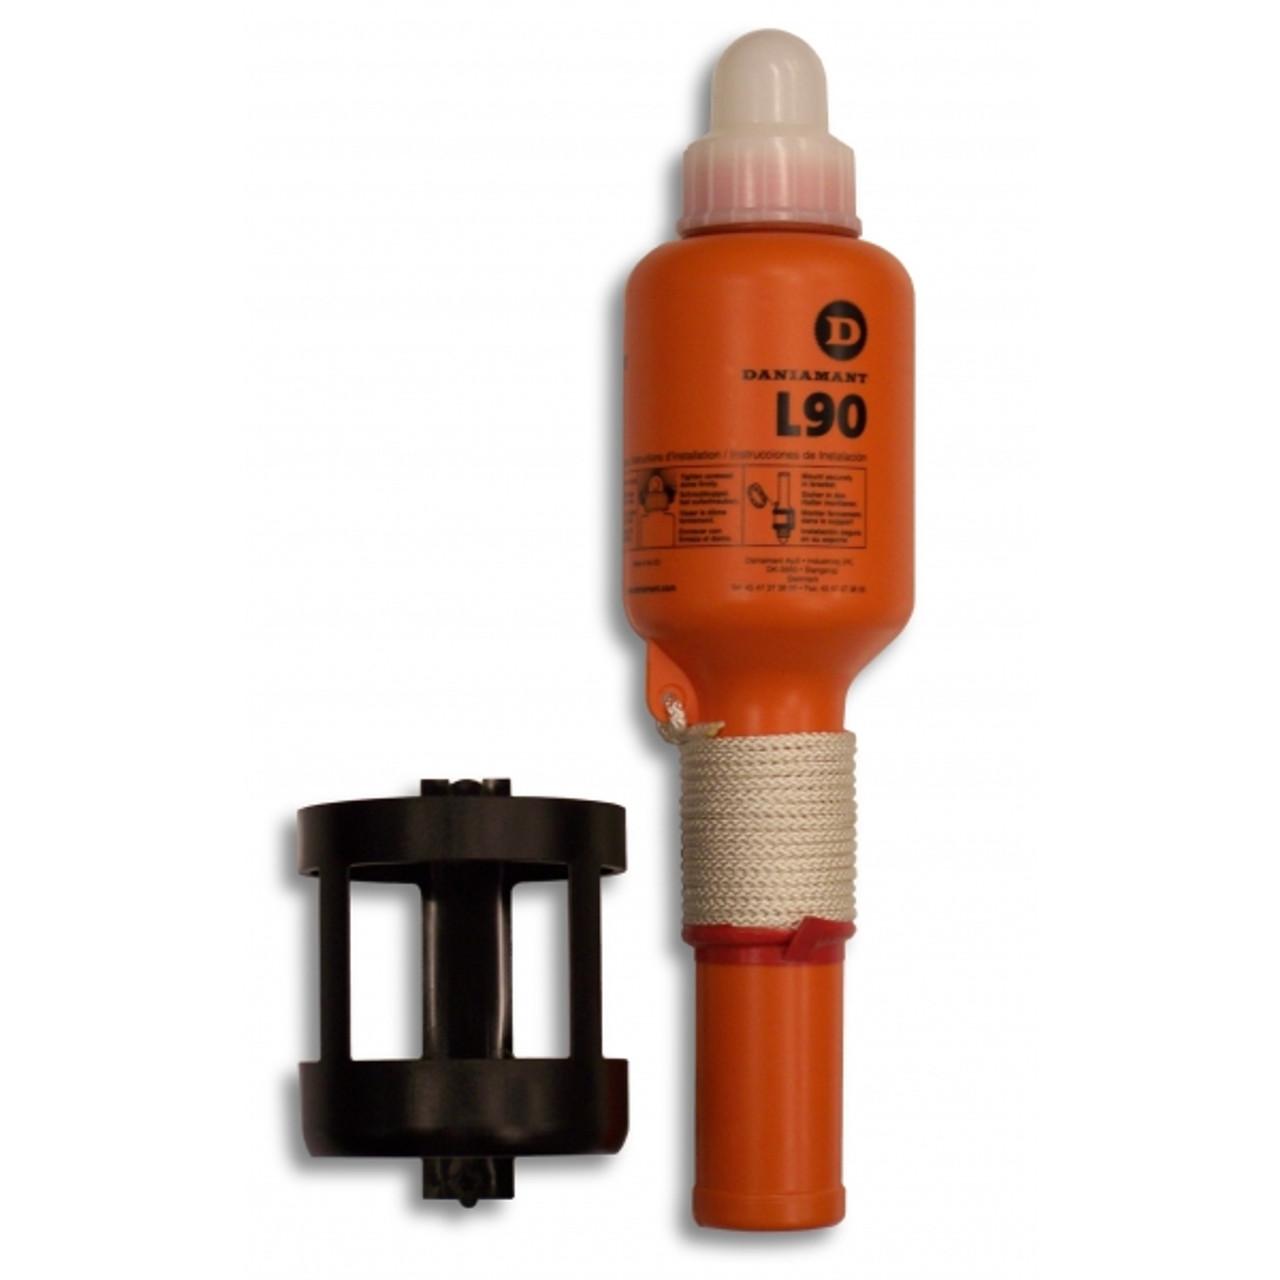 Daniamant L90 Lifebuoy Light (MLIG25)